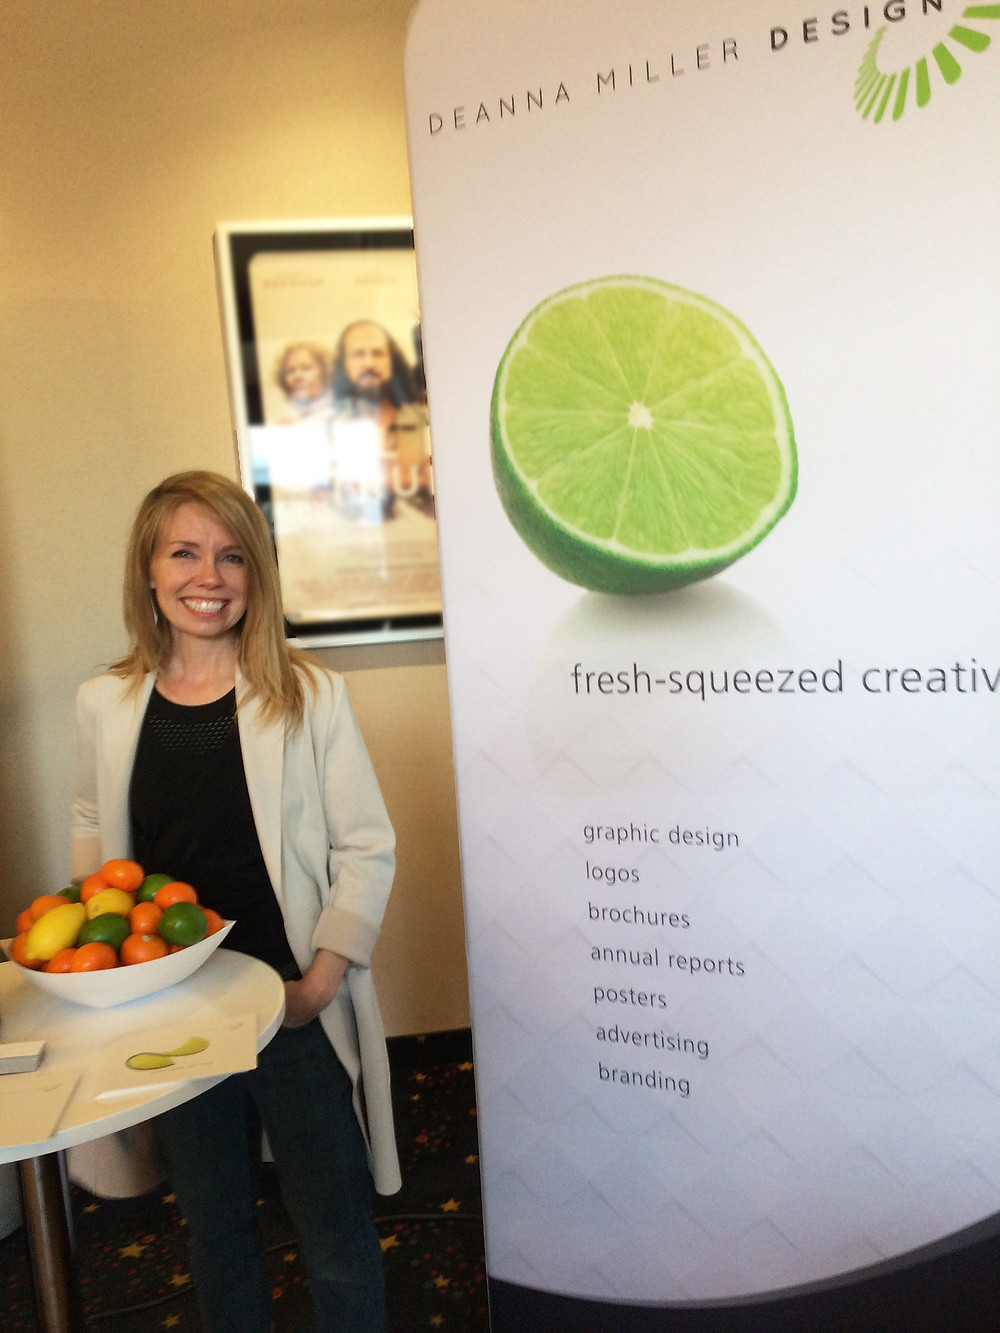 Deanna Miller Design sponsor